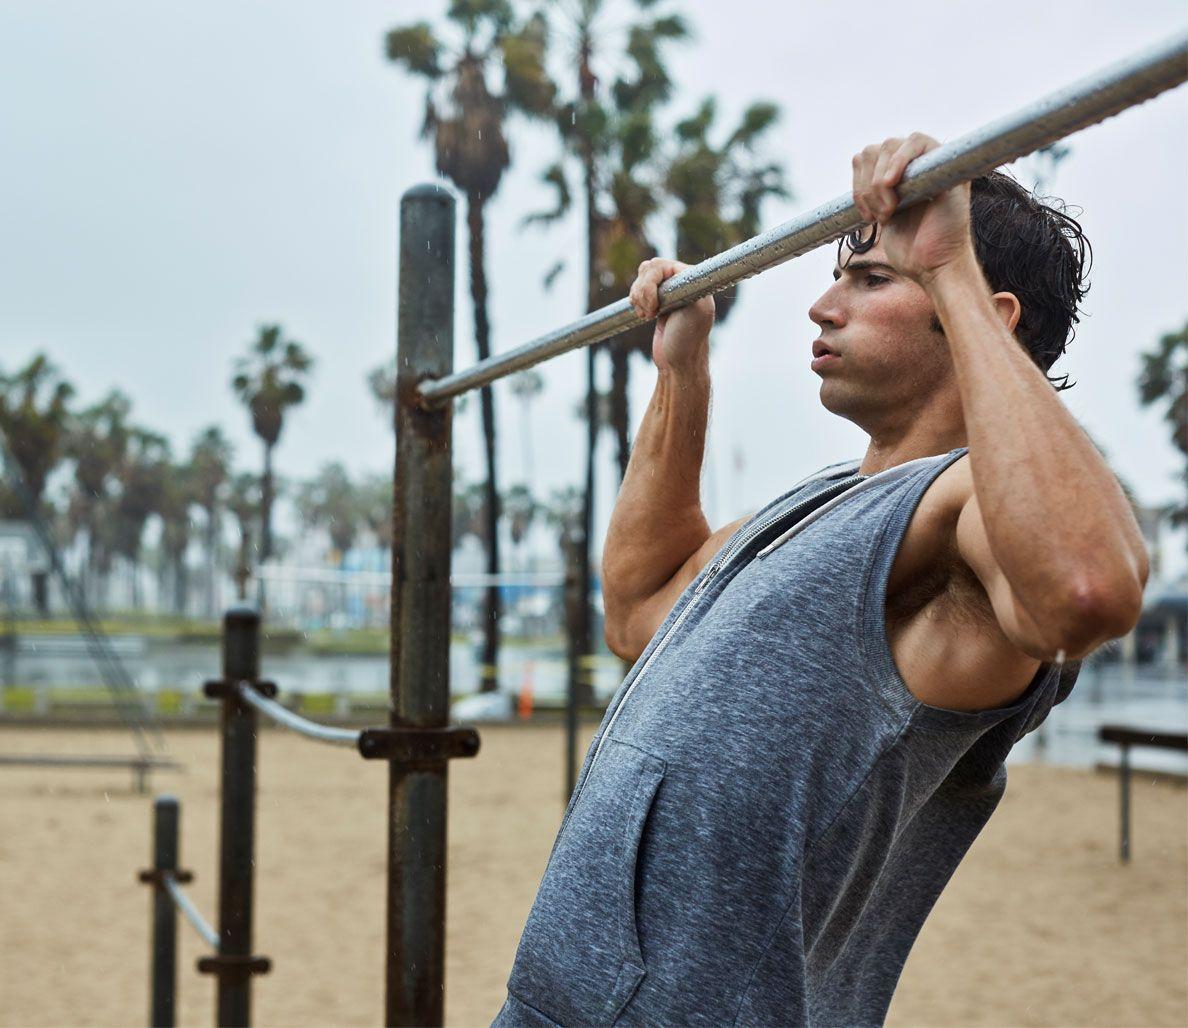 Firefighter Strength Workout | Body W | Pinterest